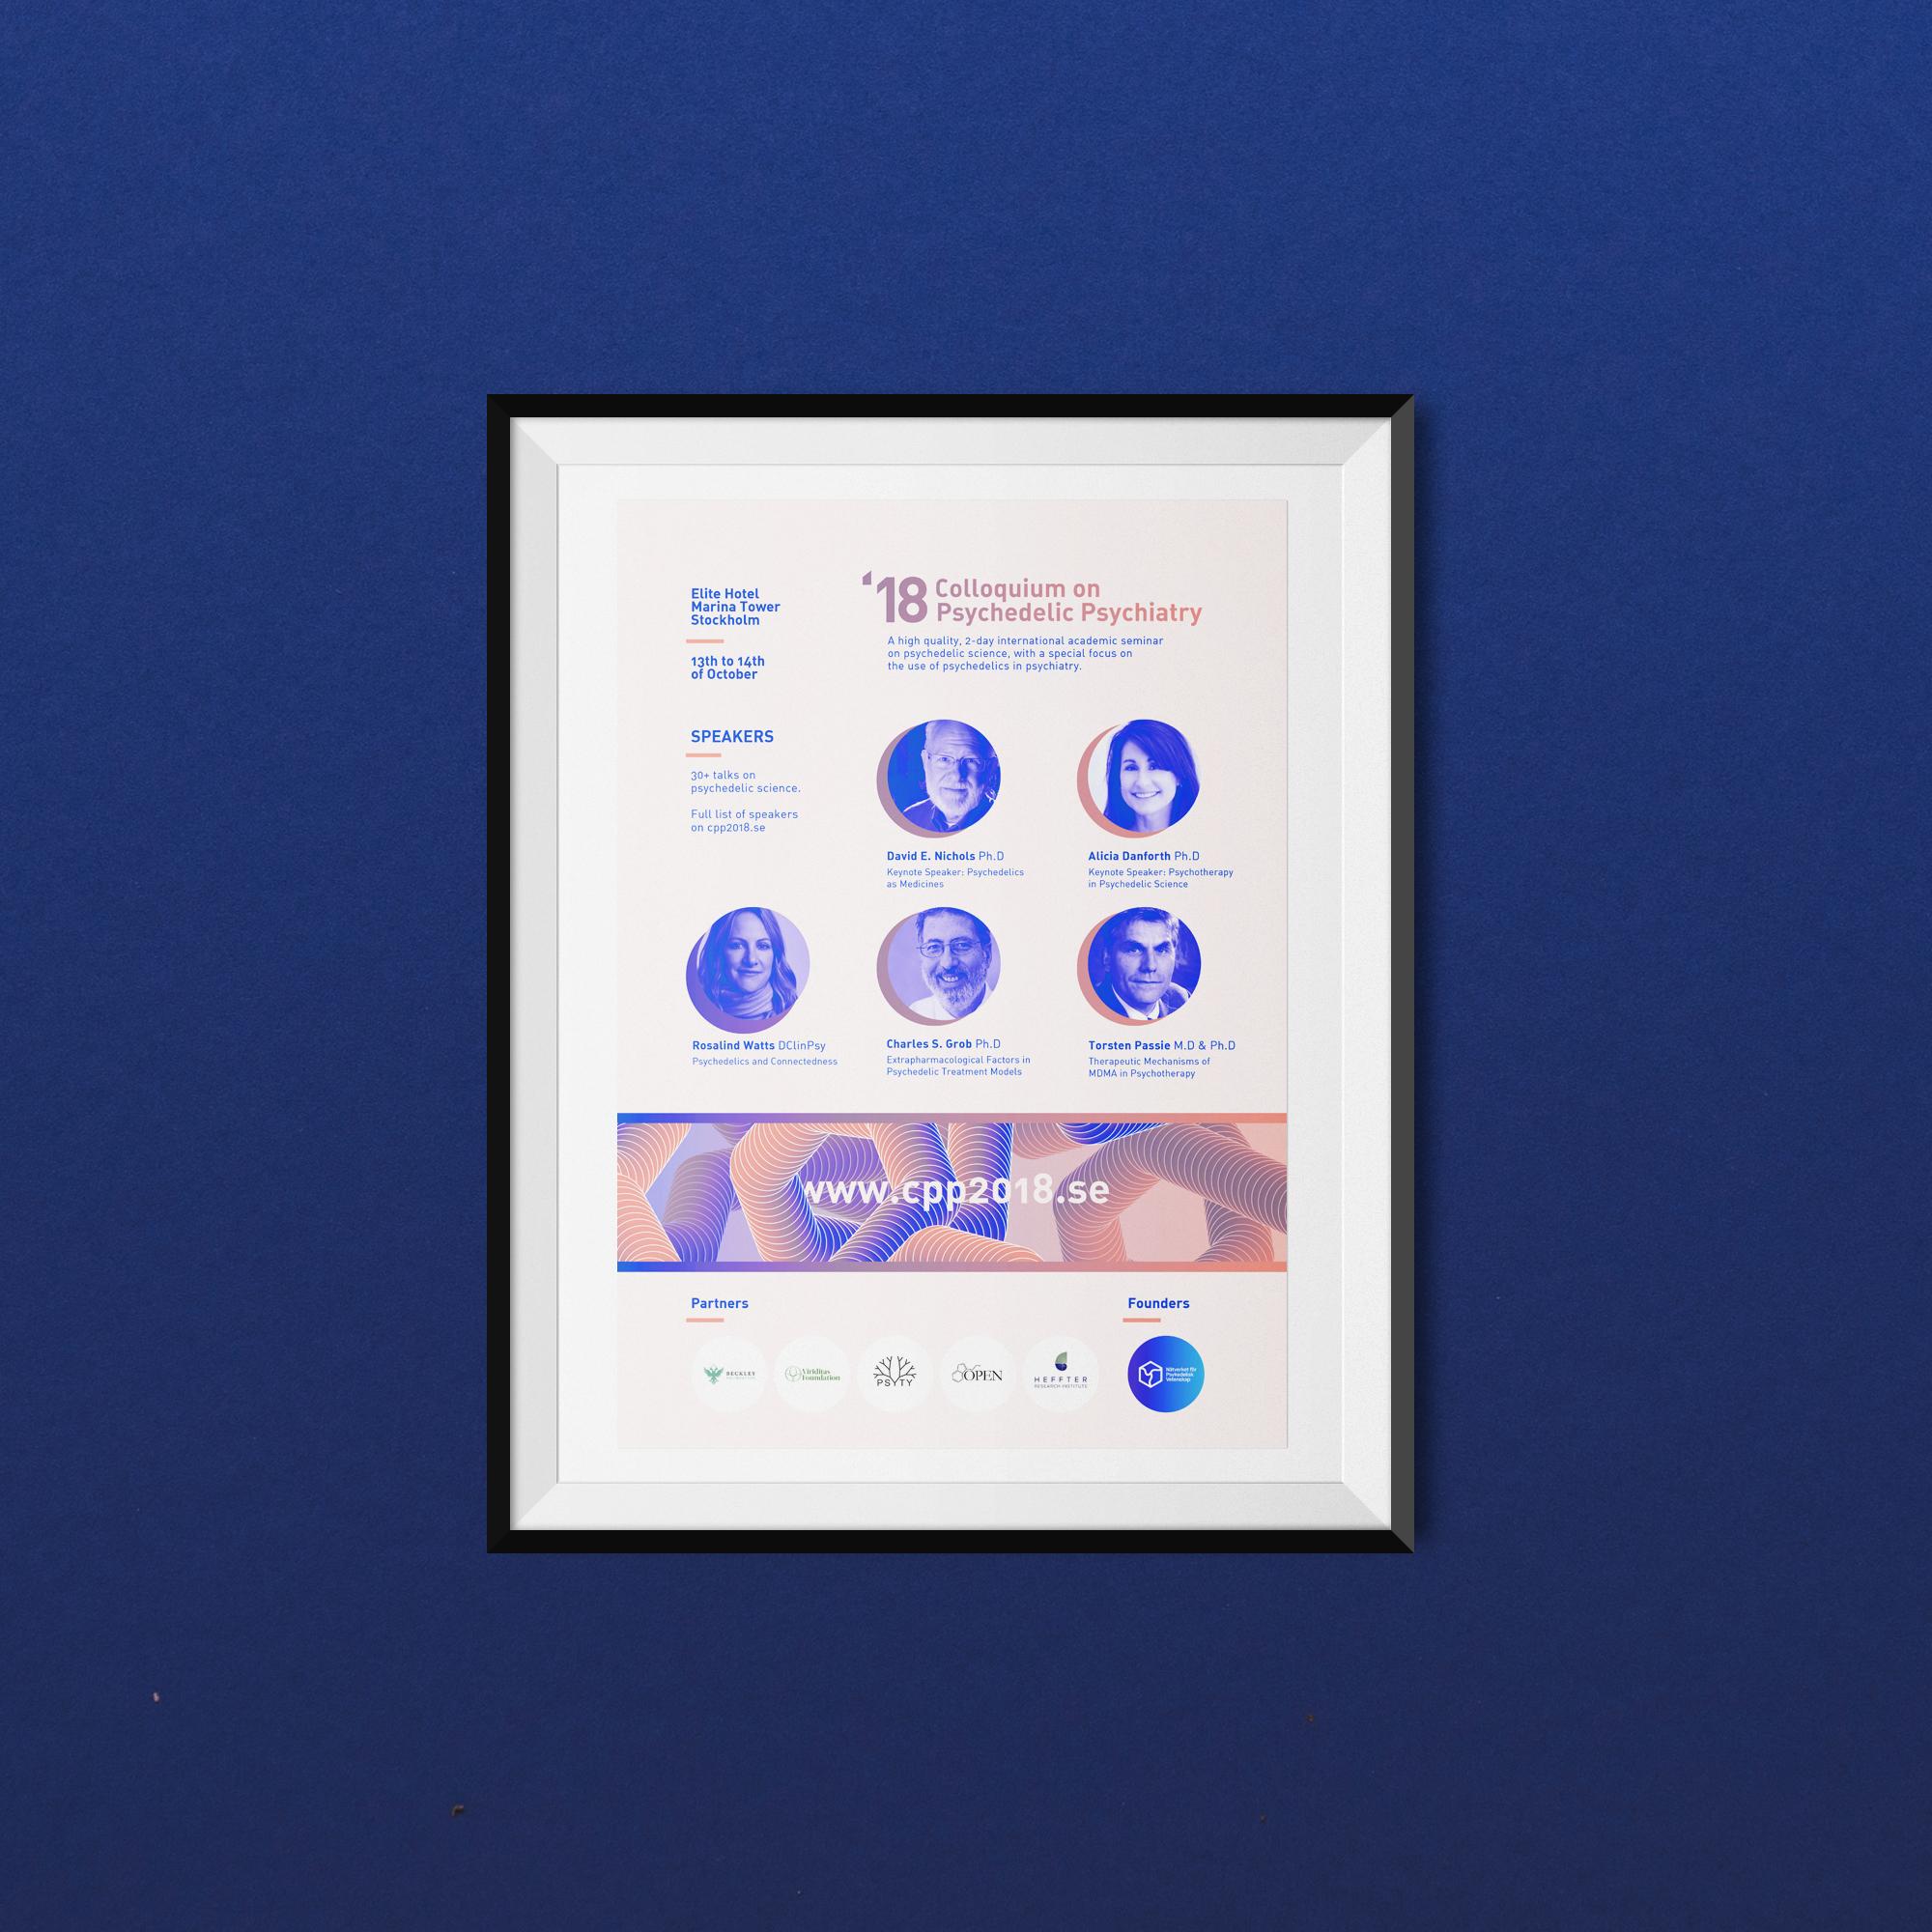 mockup_affisch_cpp2018_blue 3.jpg